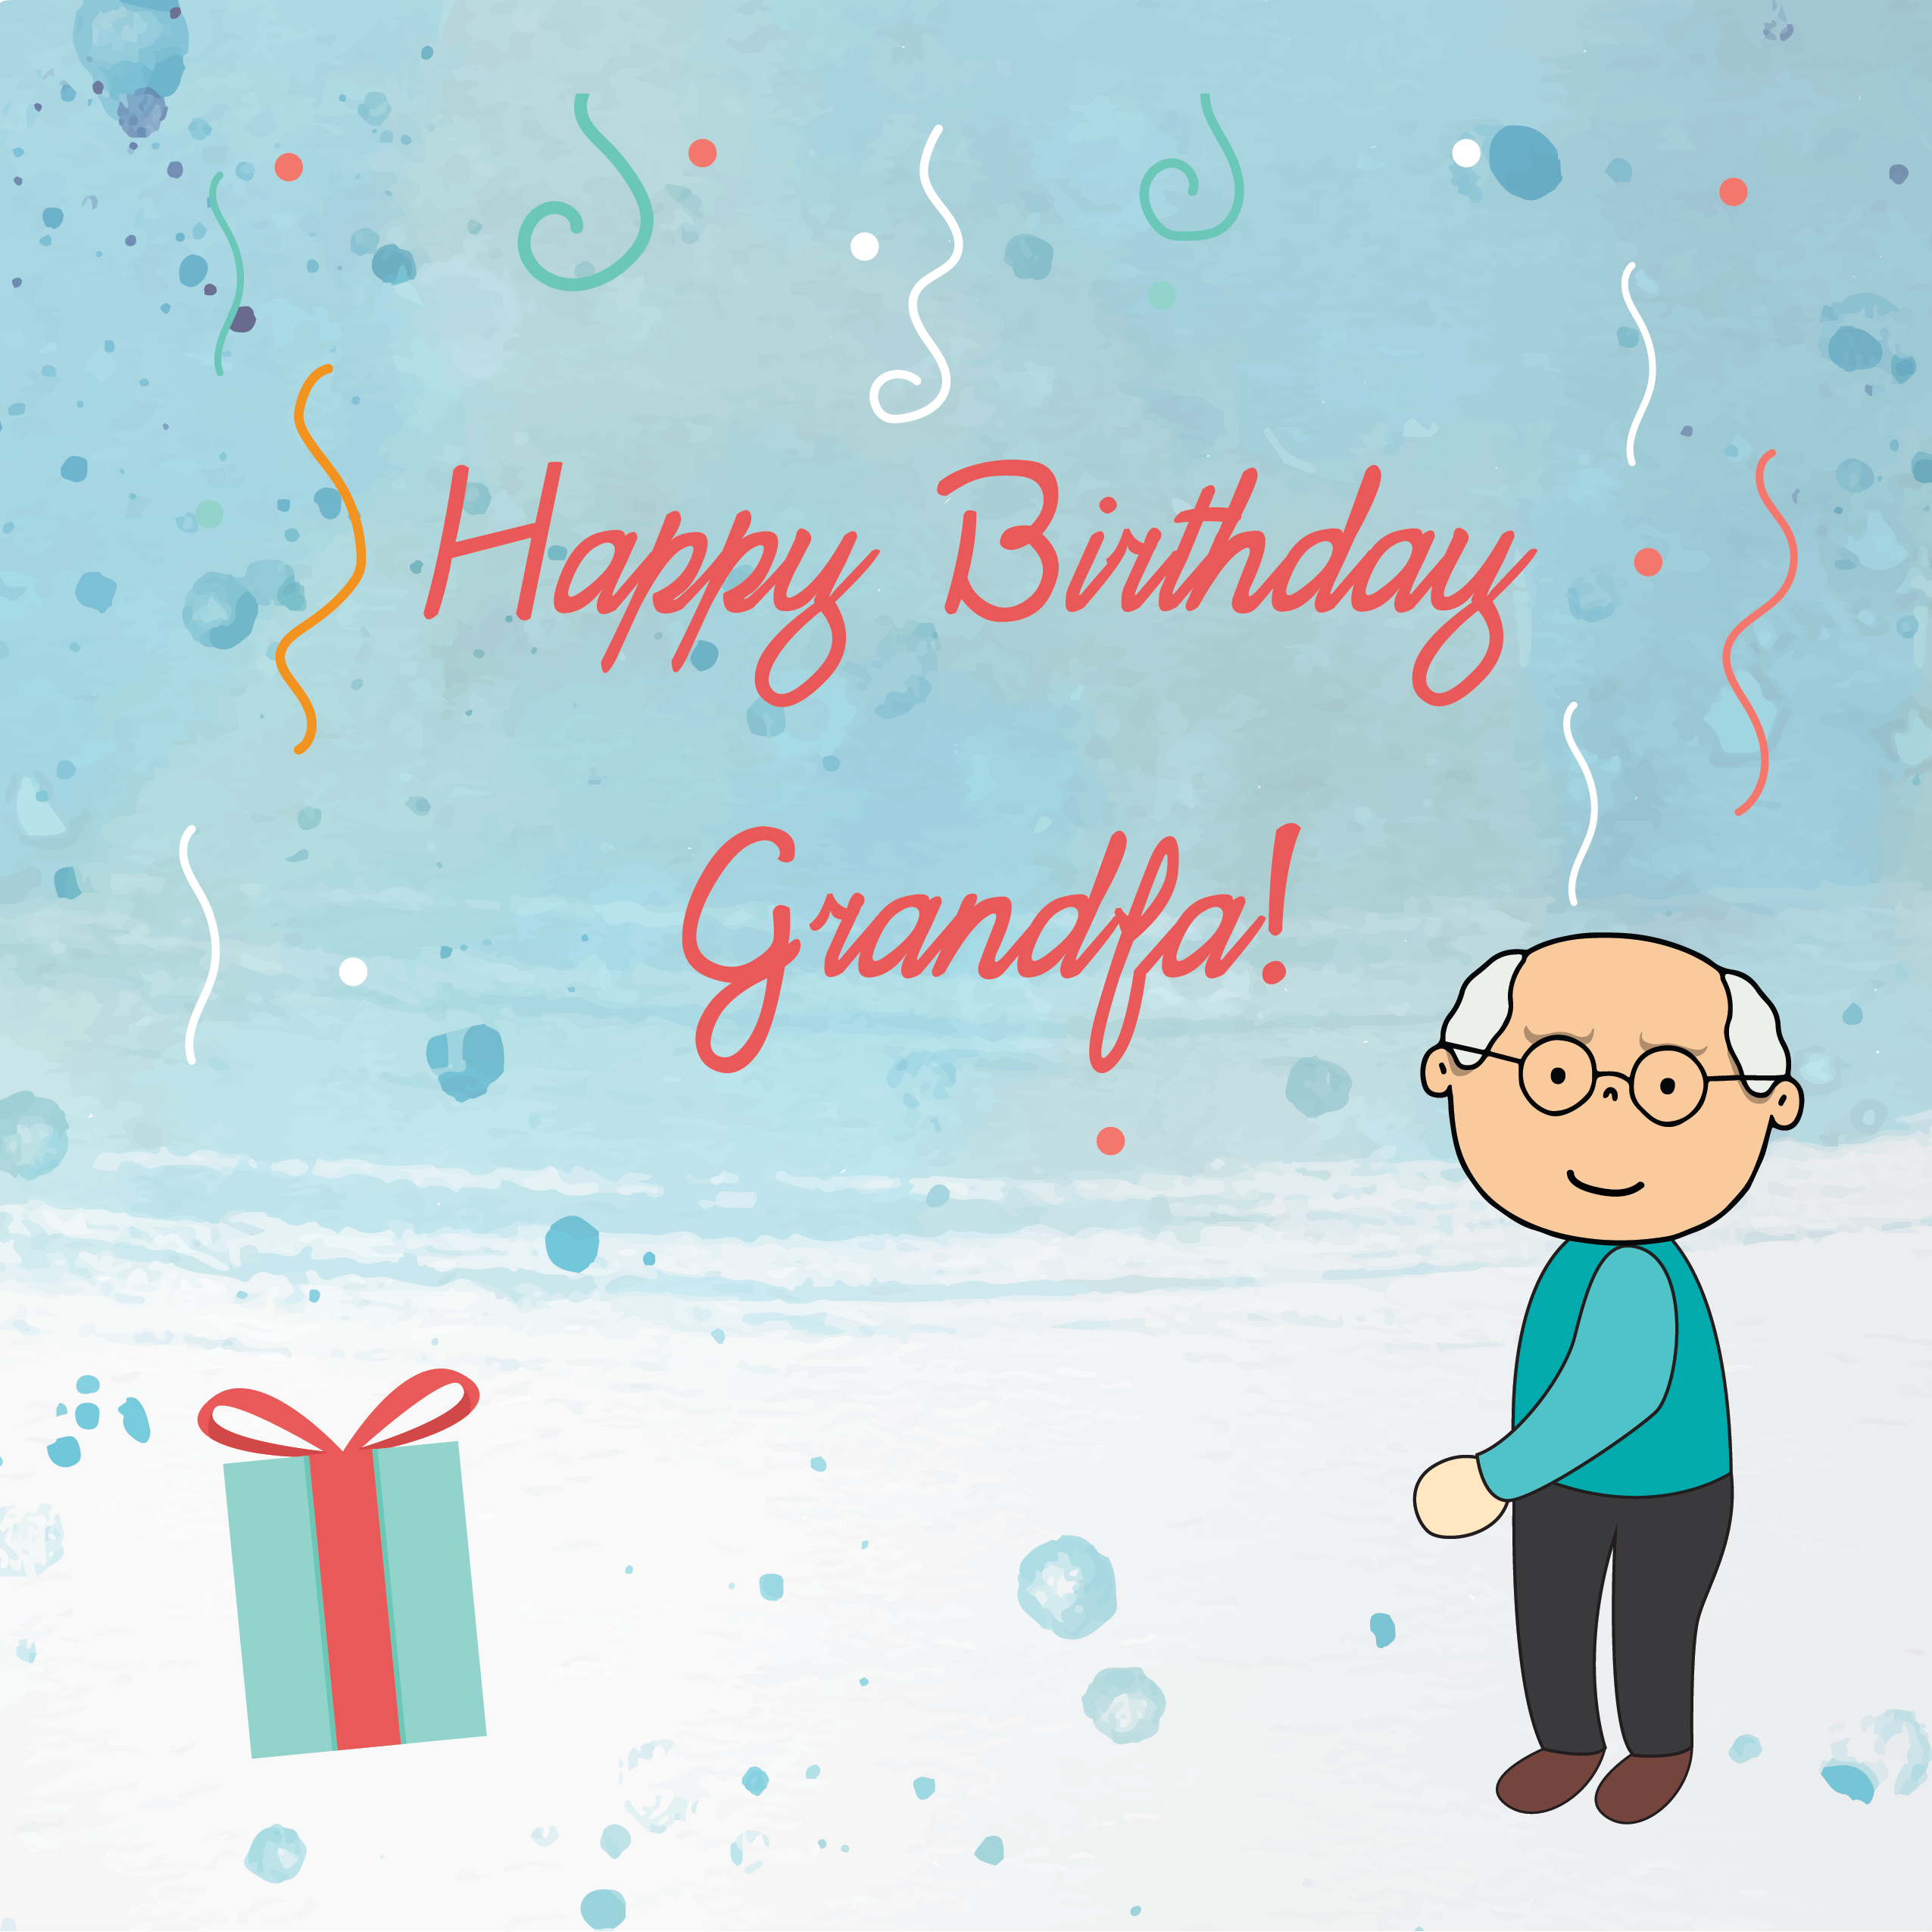 Happy-Birthday-Wishes-Grandpa